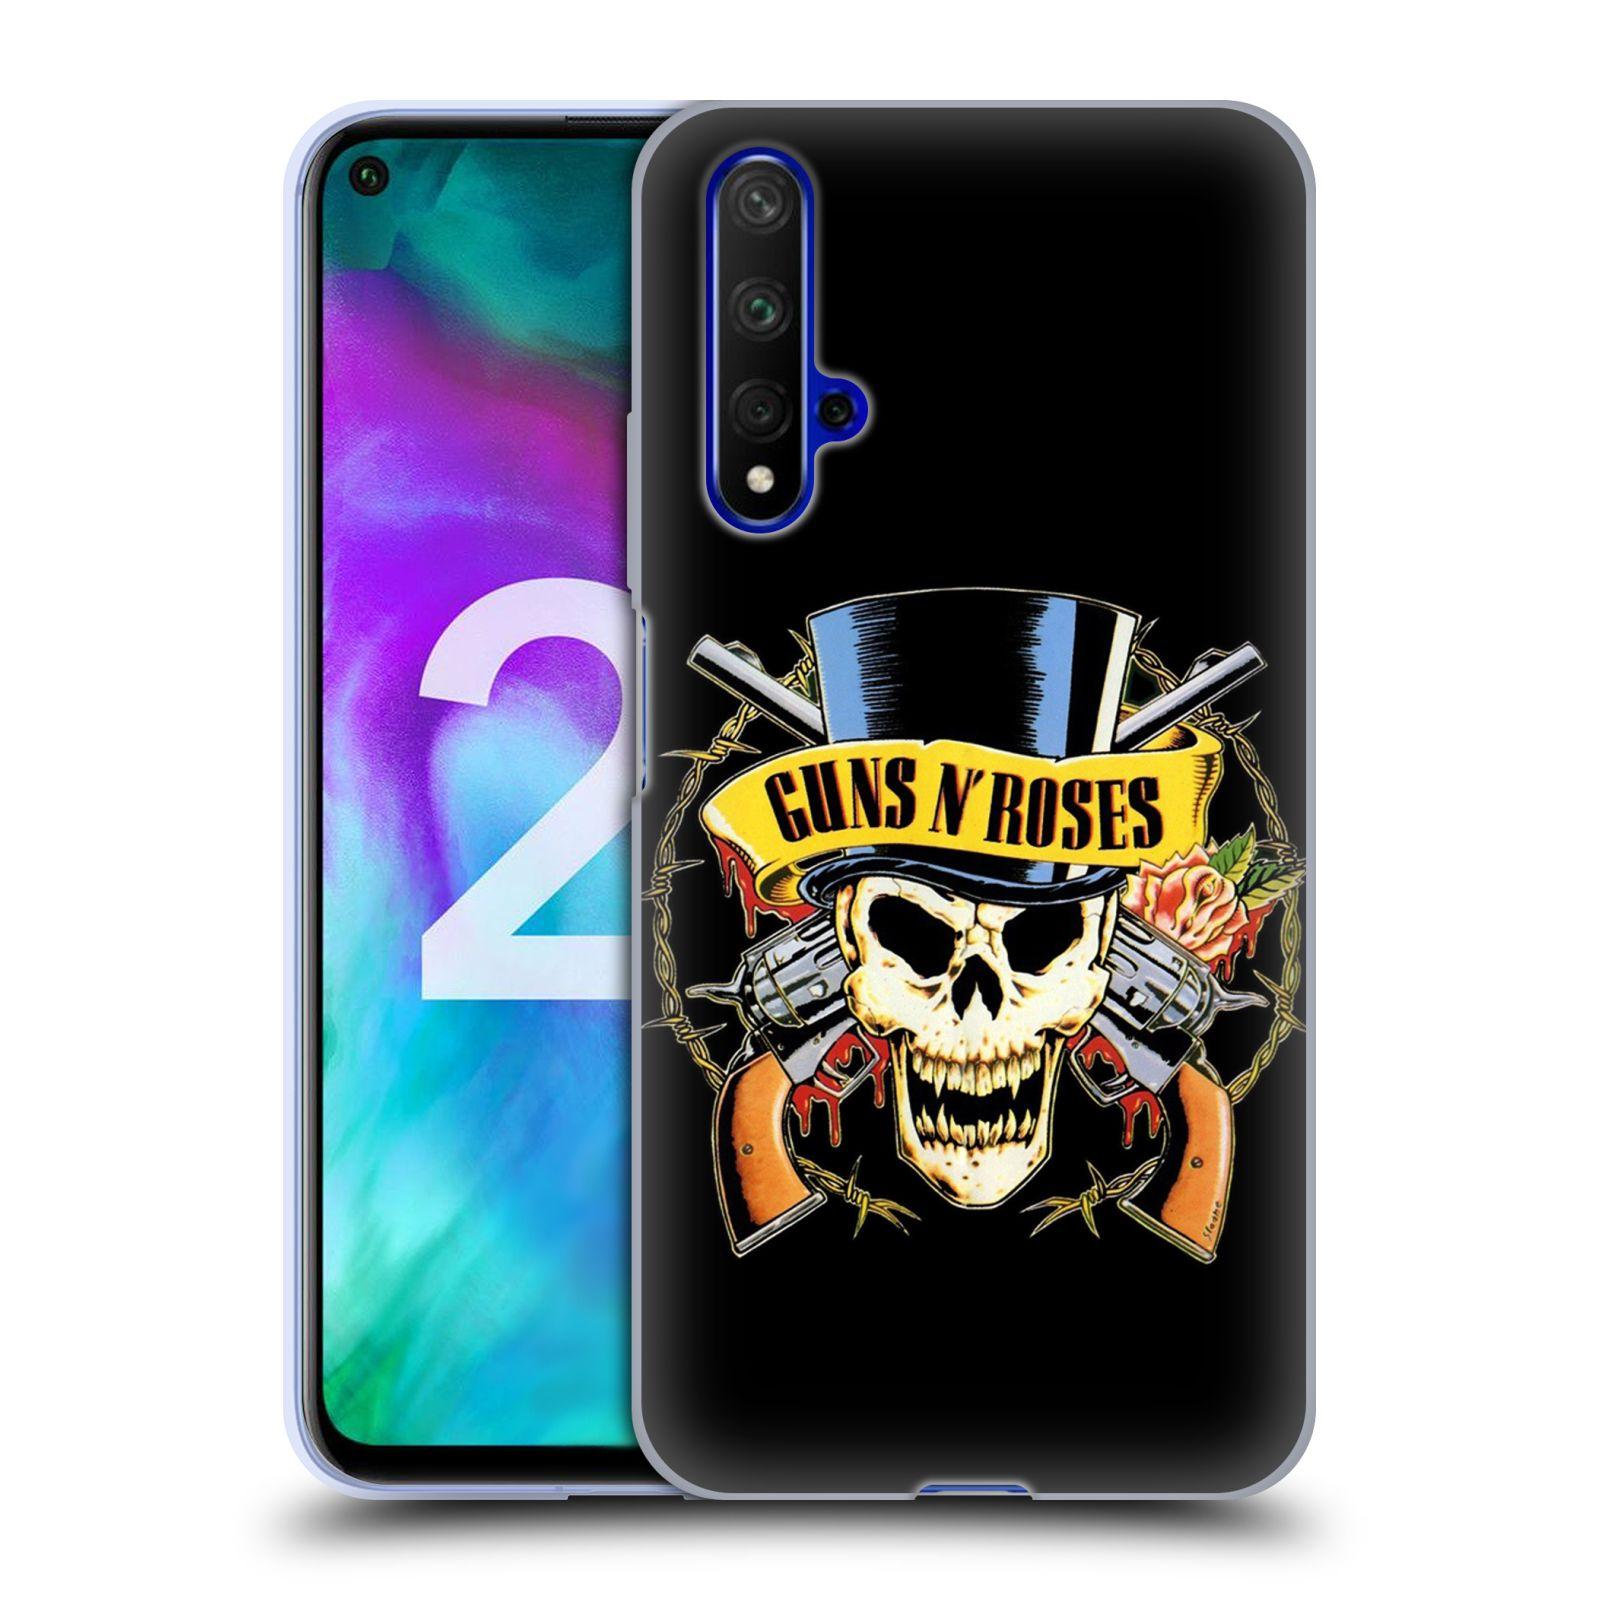 Silikonové pouzdro na mobil Honor 20 - Head Case - Guns N' Roses - Lebka